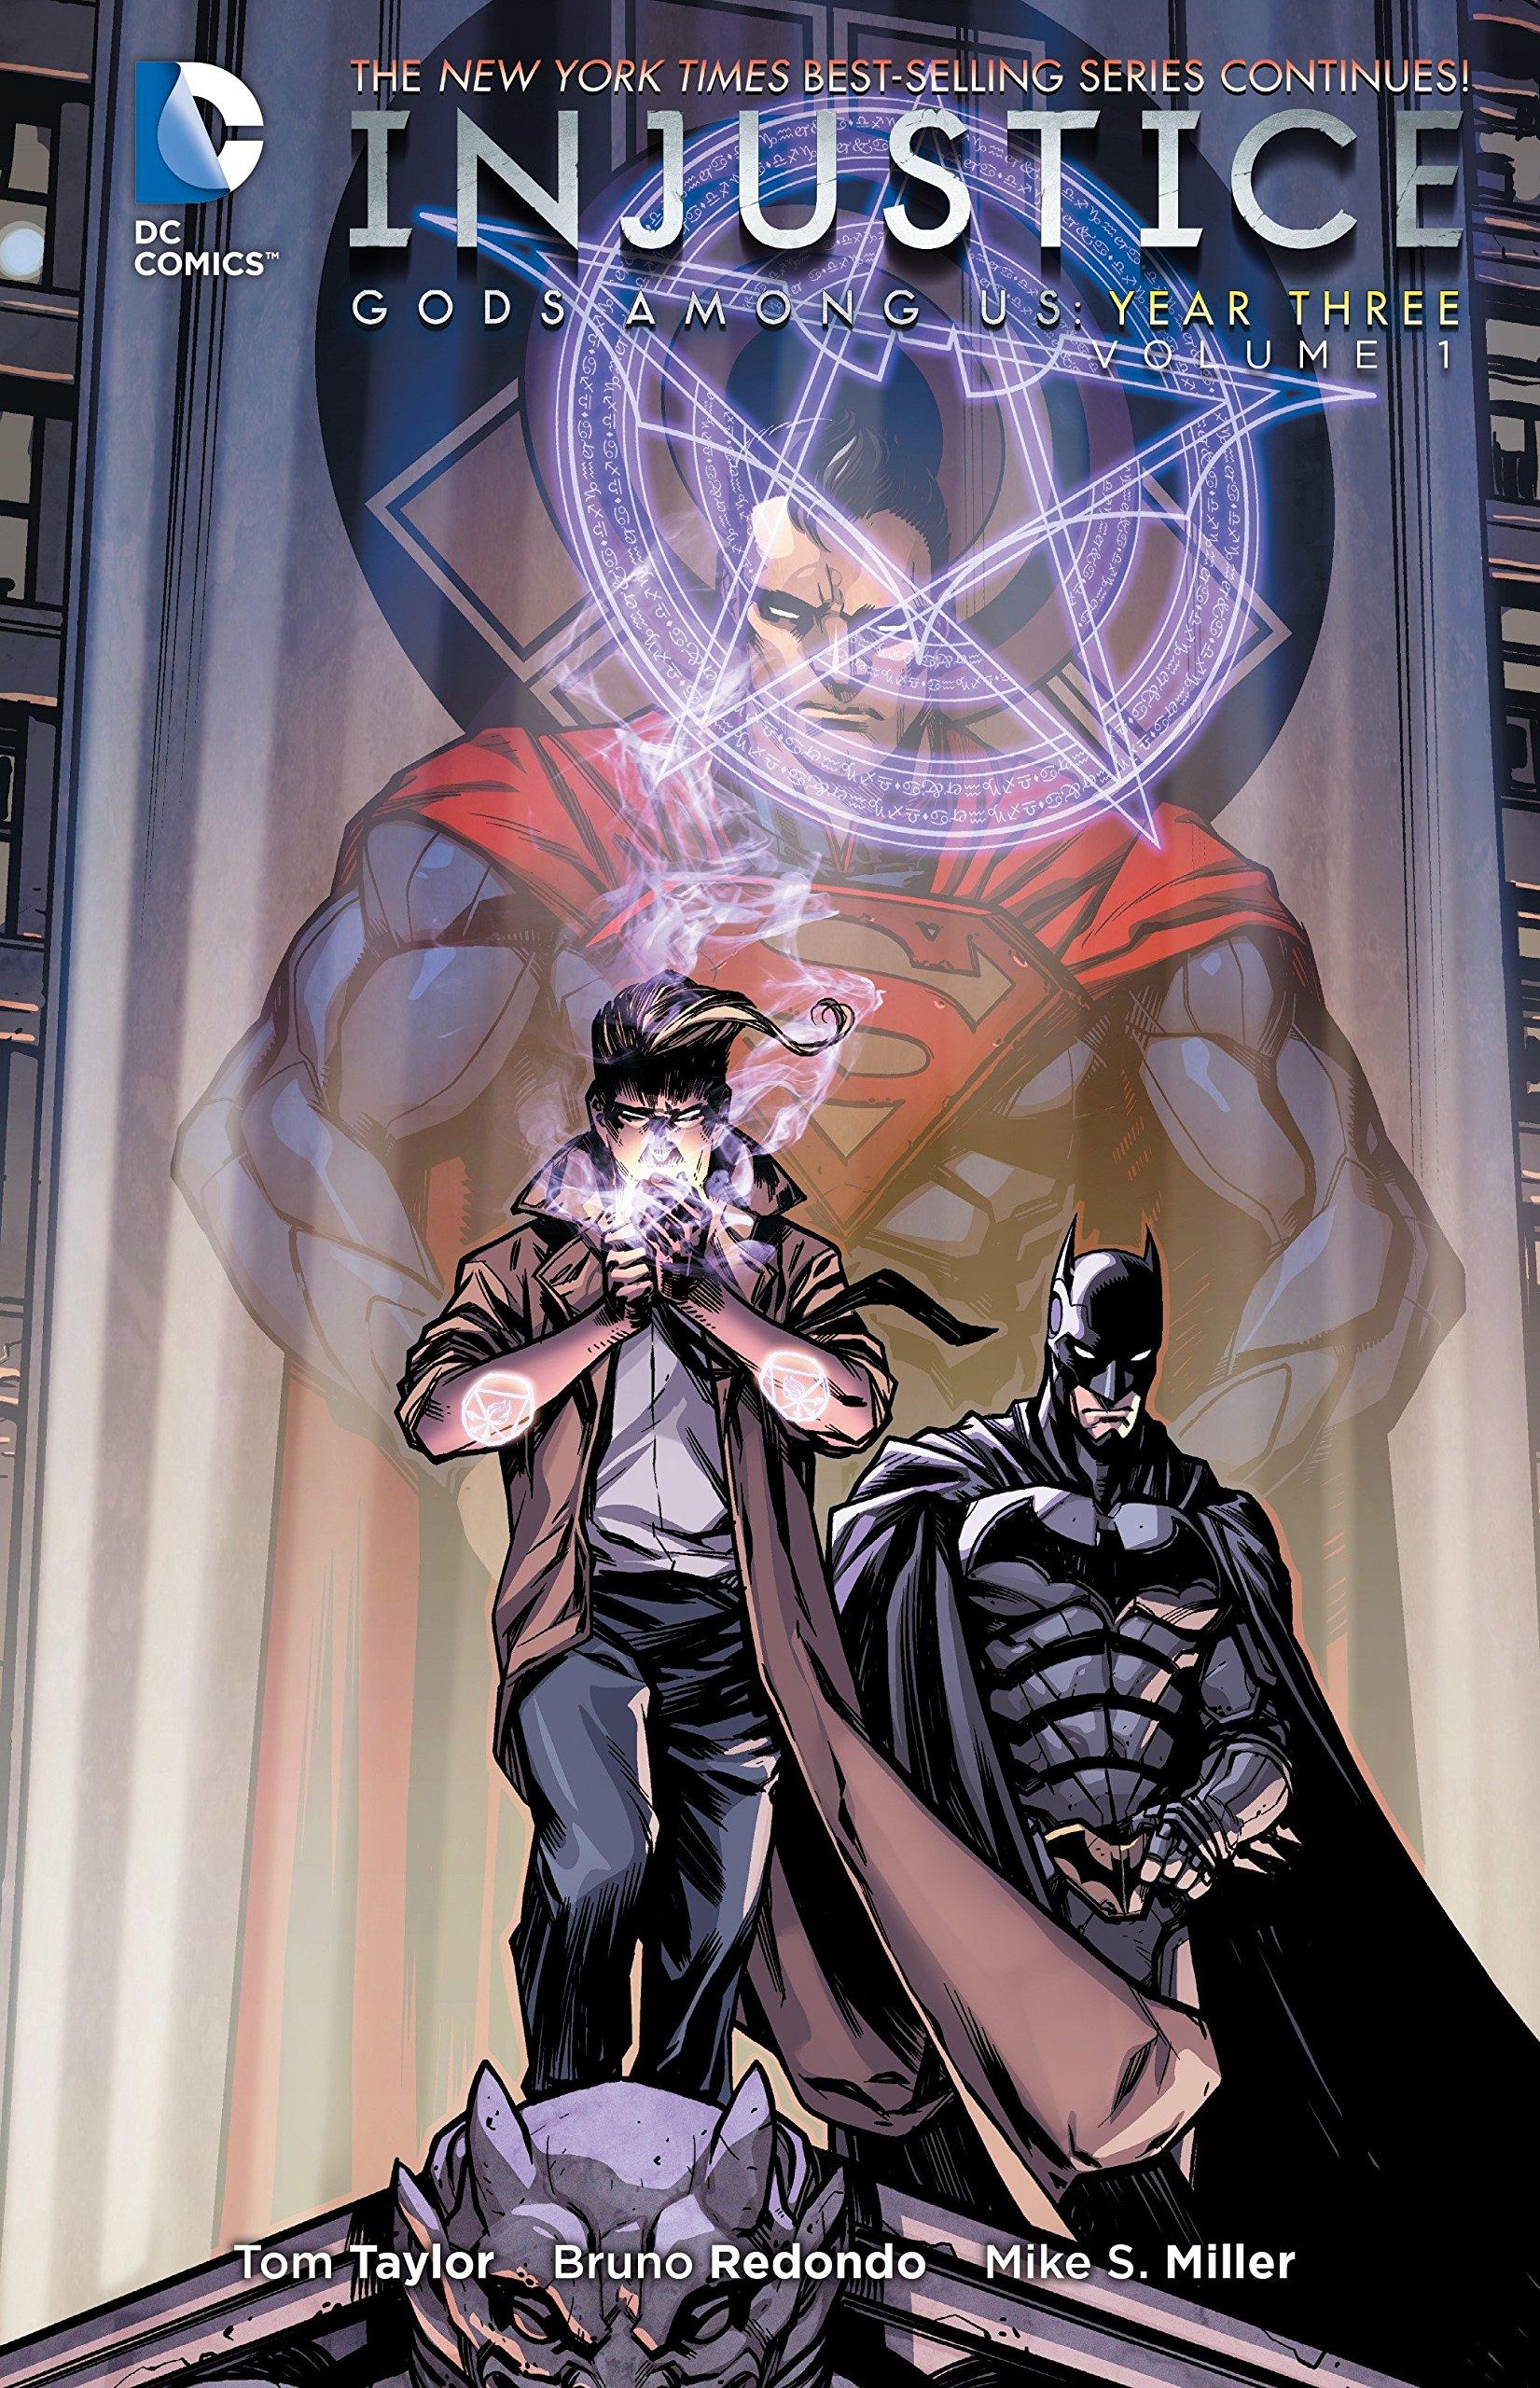 Injustice: Gods Among Us: Year Three Vol. 1 by Diamond Comics